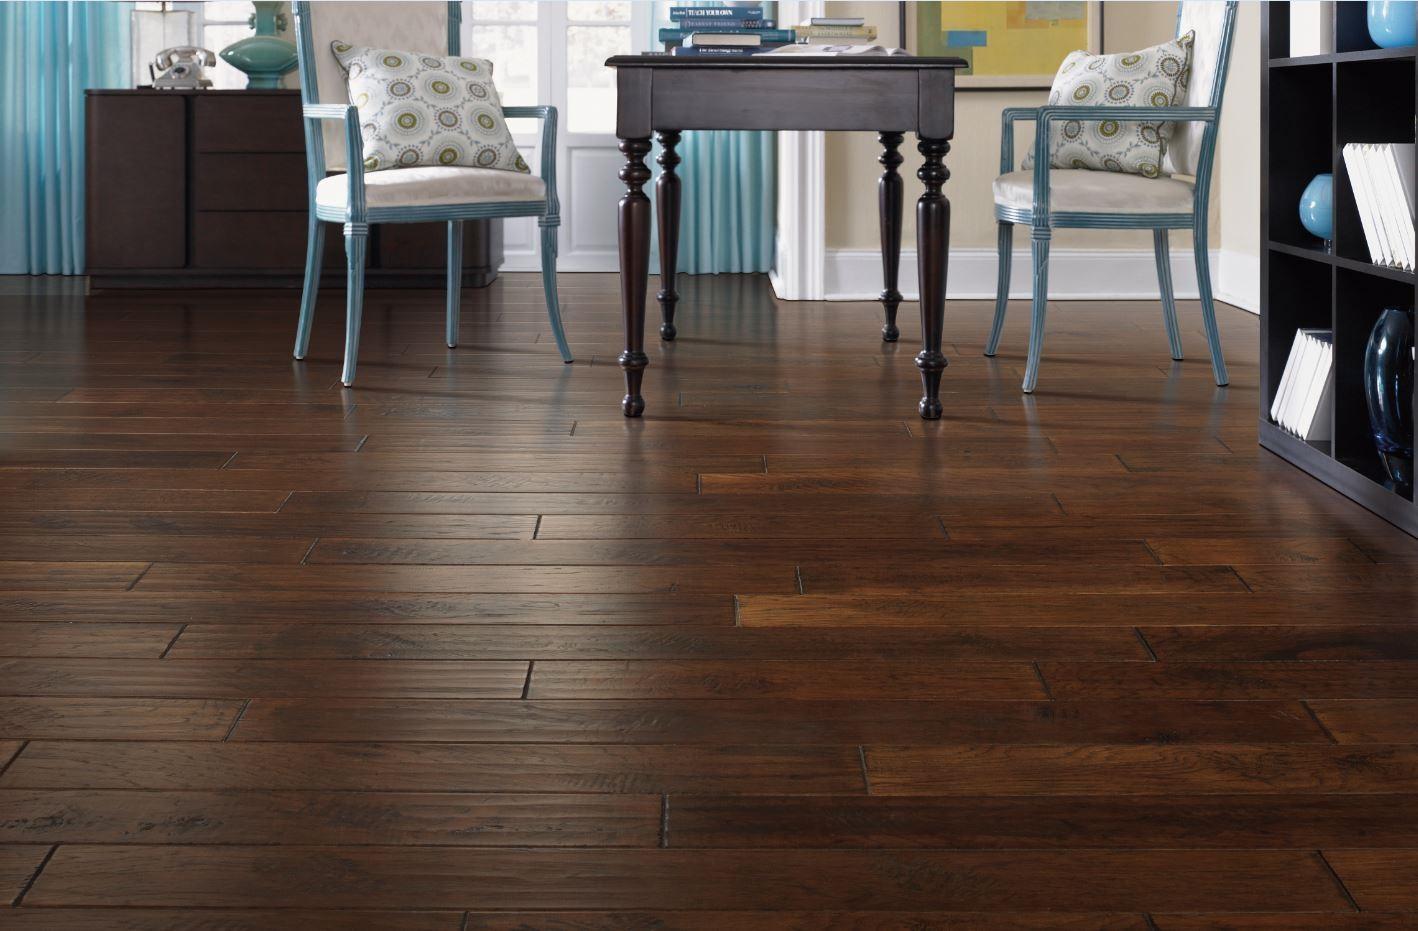 Hardwood flooring providing an upscale look in a Keller, TX home